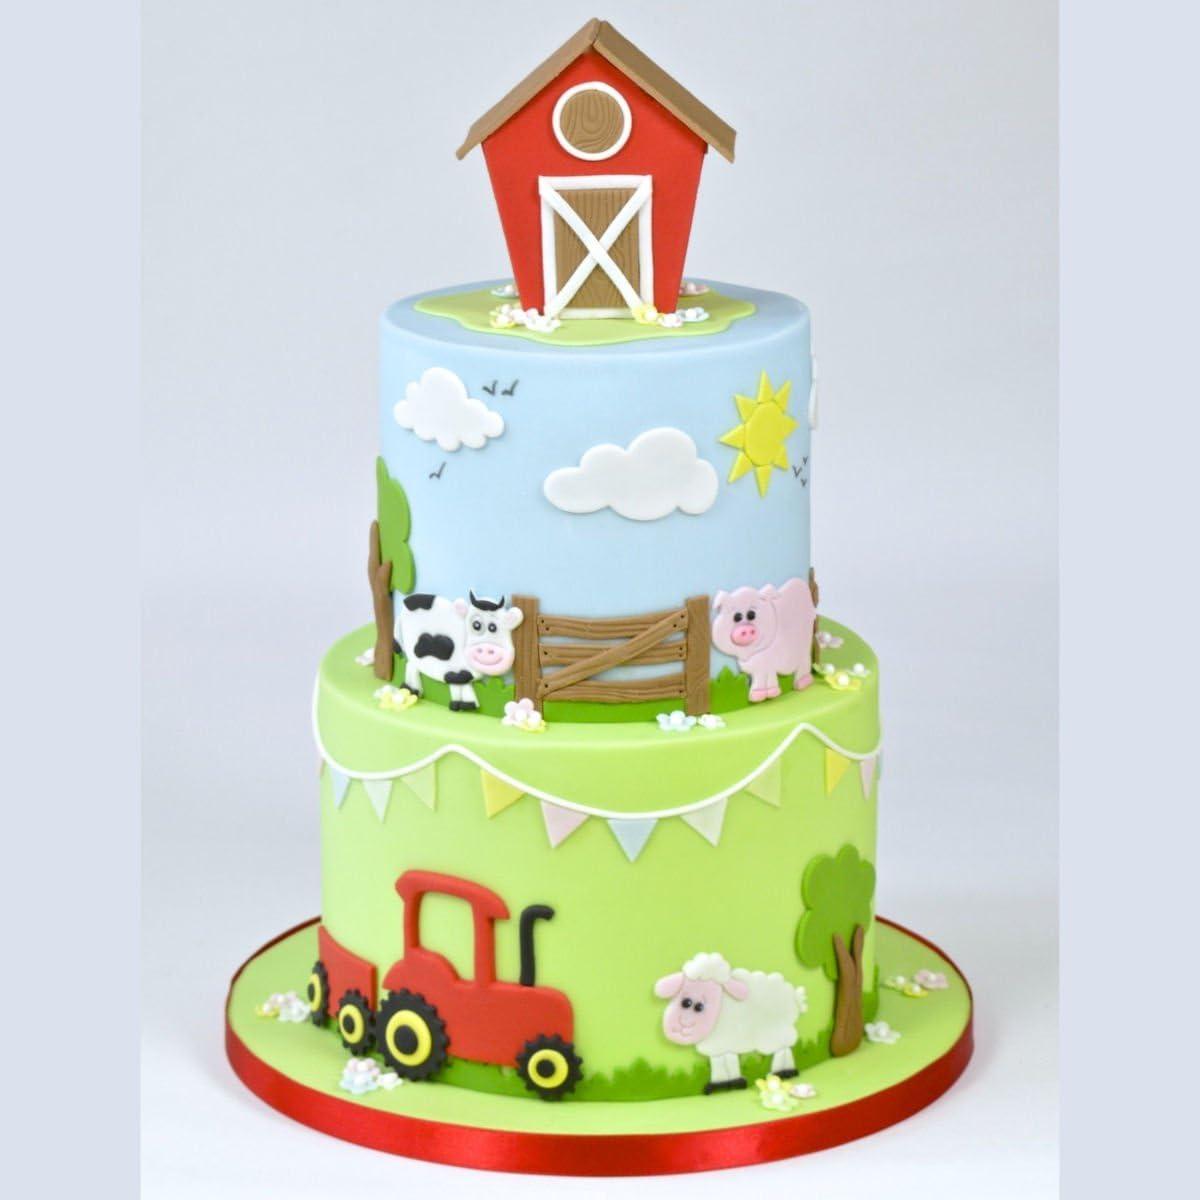 Amazing Fmm Sugarcraft Tractor Cutter Set Cake Decoration Icing Funny Birthday Cards Online Unhofree Goldxyz